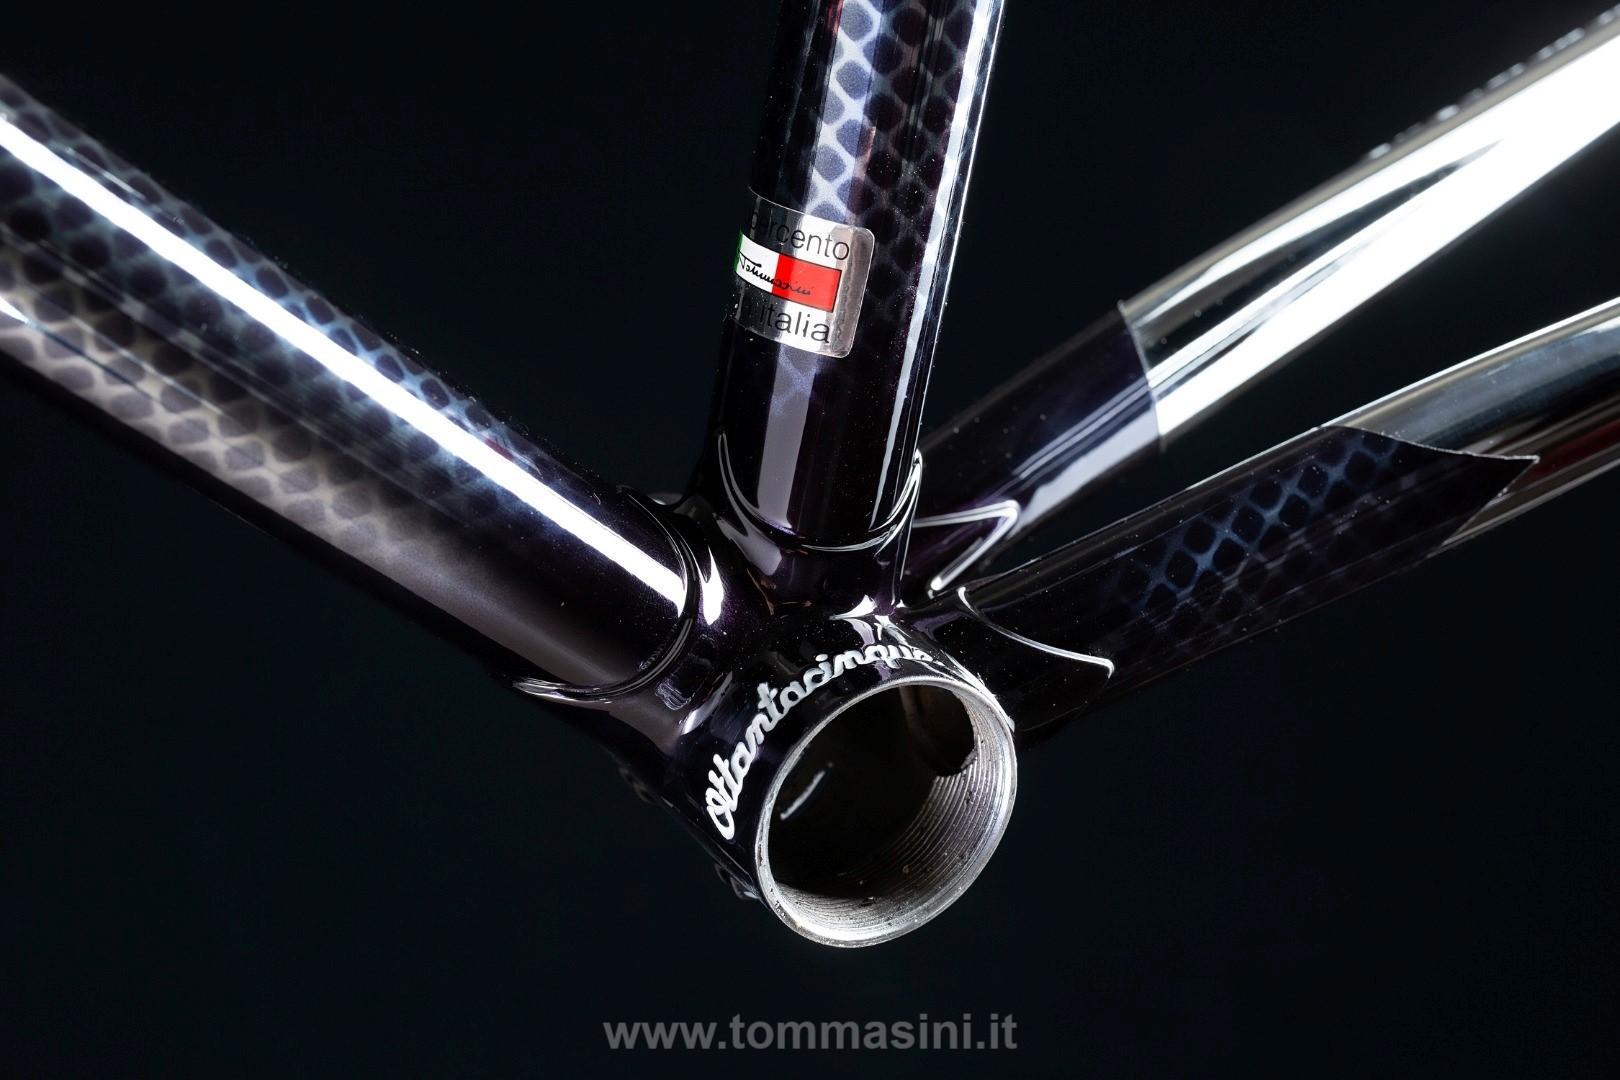 OceanCyclery_Tommasini_Prestige_12